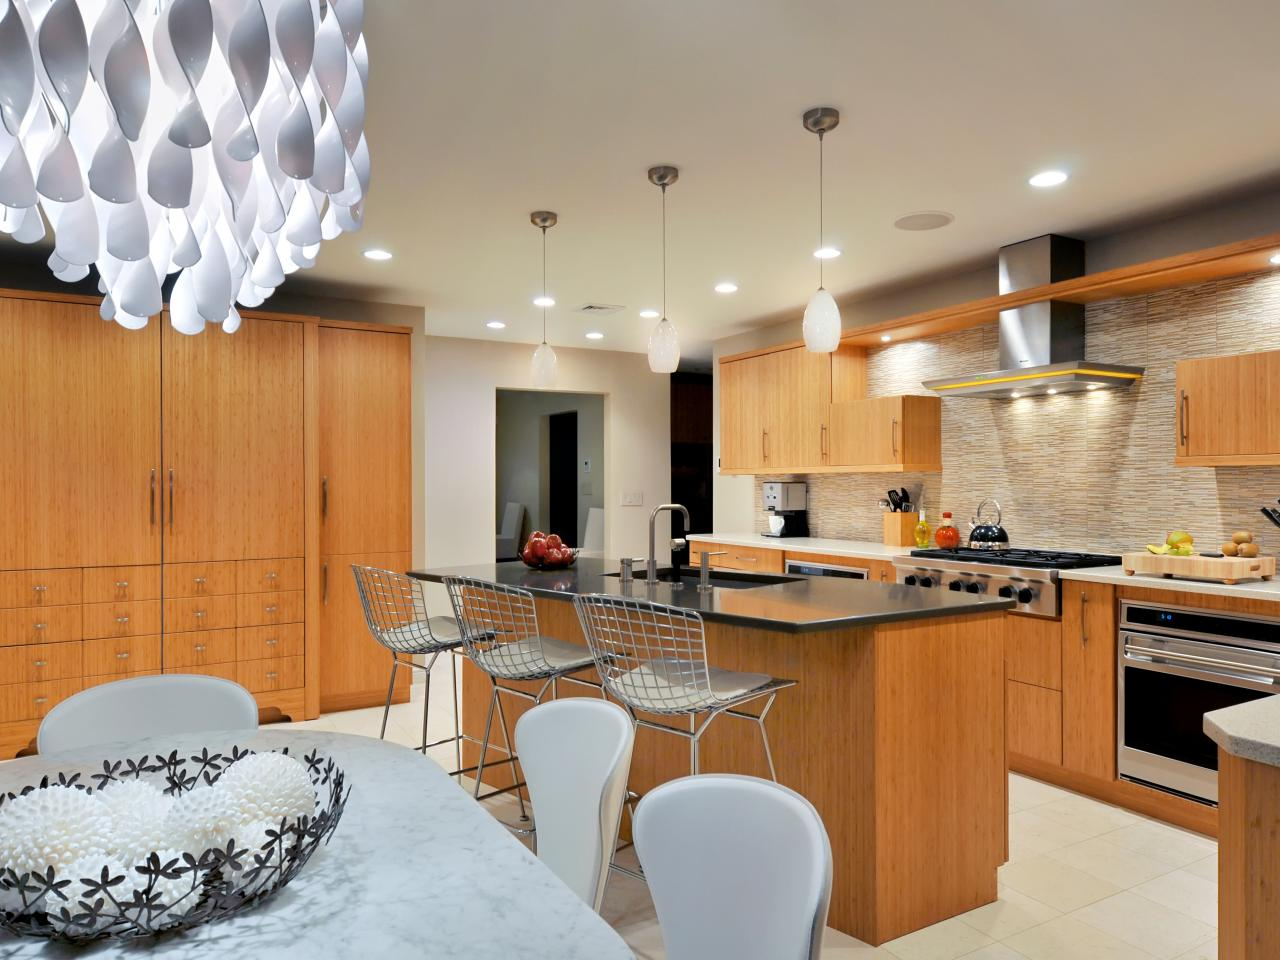 Modern kitchen window treatments hgtv pictures ideas hgtv - Consumers kitchen and bath commack ...